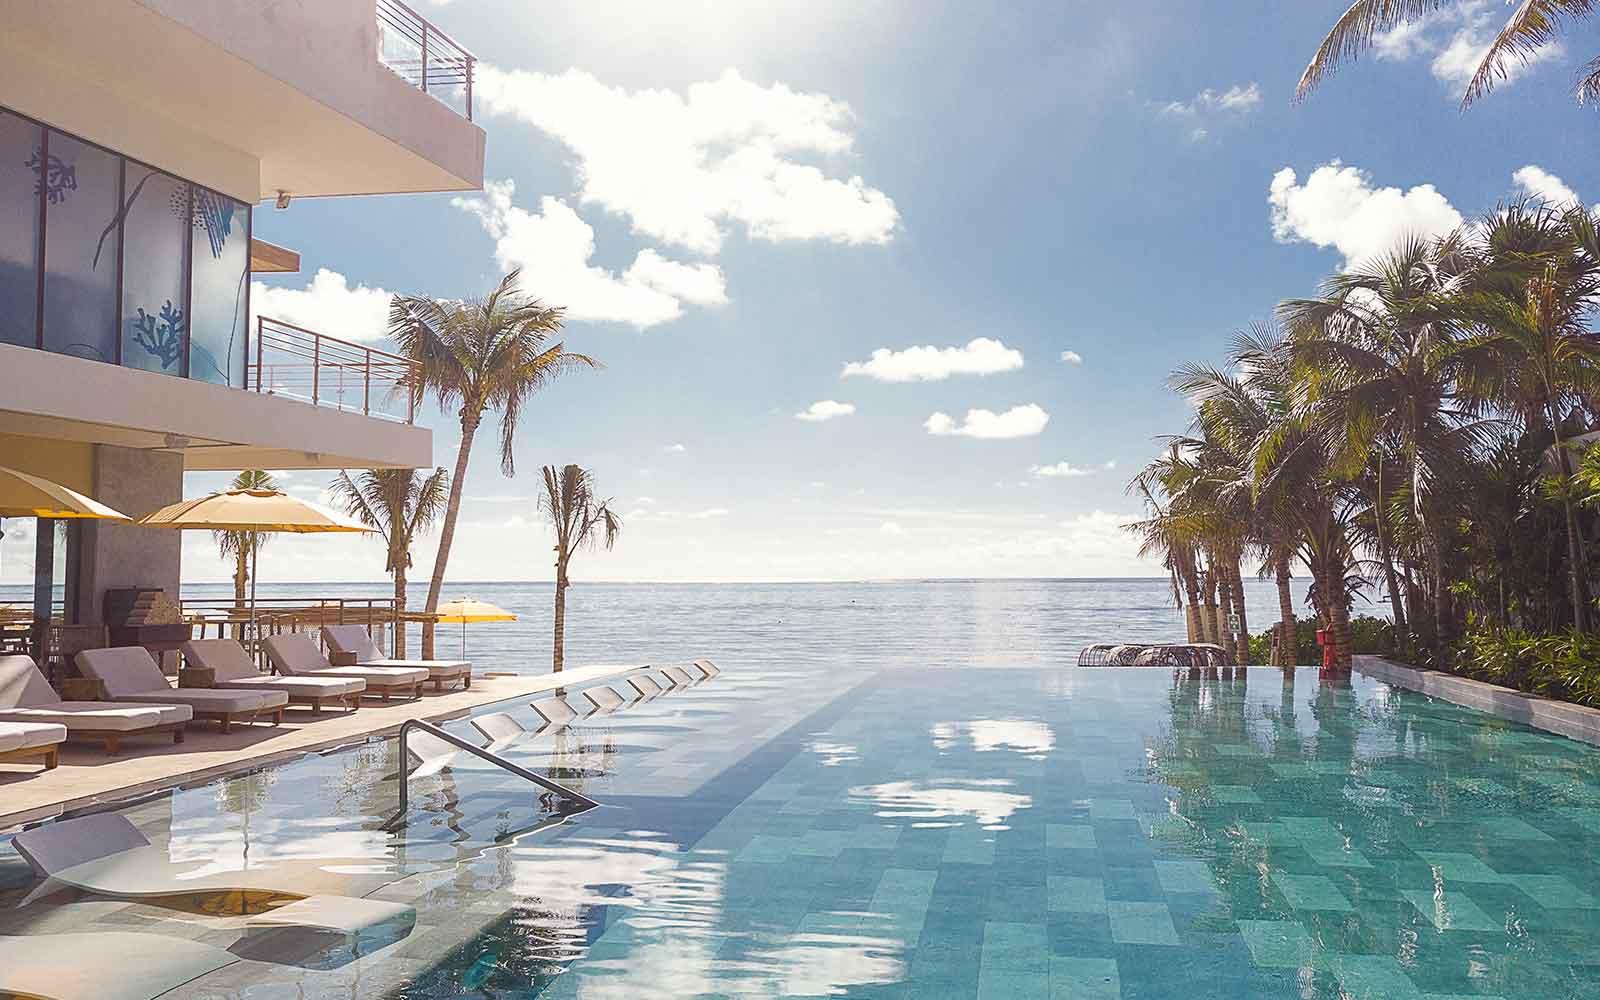 Аренда апартаментов в отеле на пляже в Пуэрто Морелос